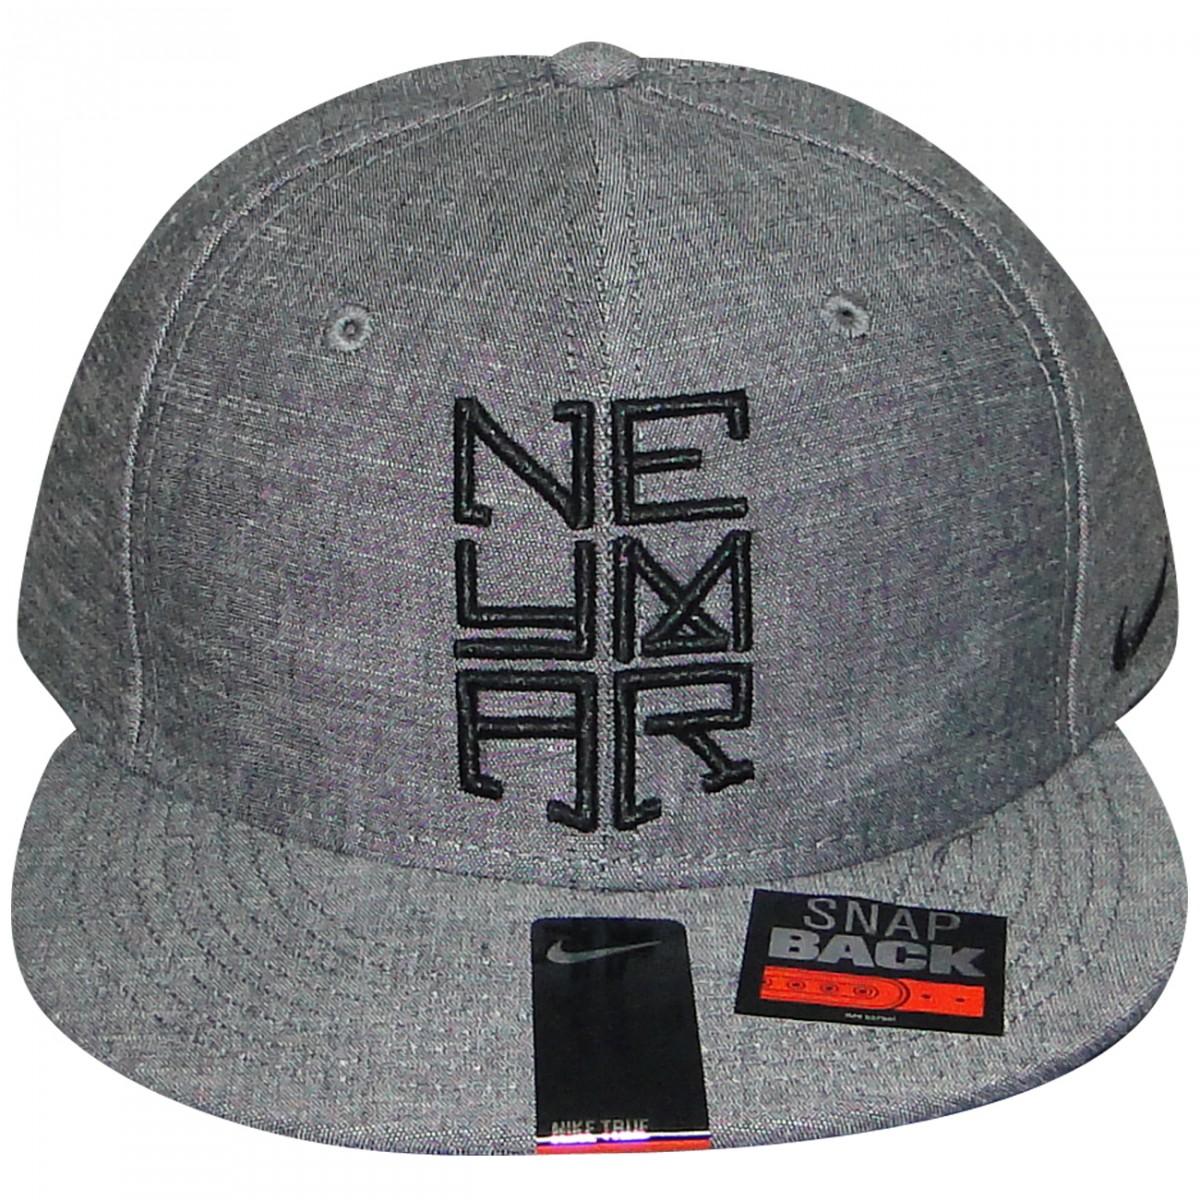 Bone Nike Neymar 612660 612660 032 - Grafite Preto - Chuteira Nike ... bedab6eb85b